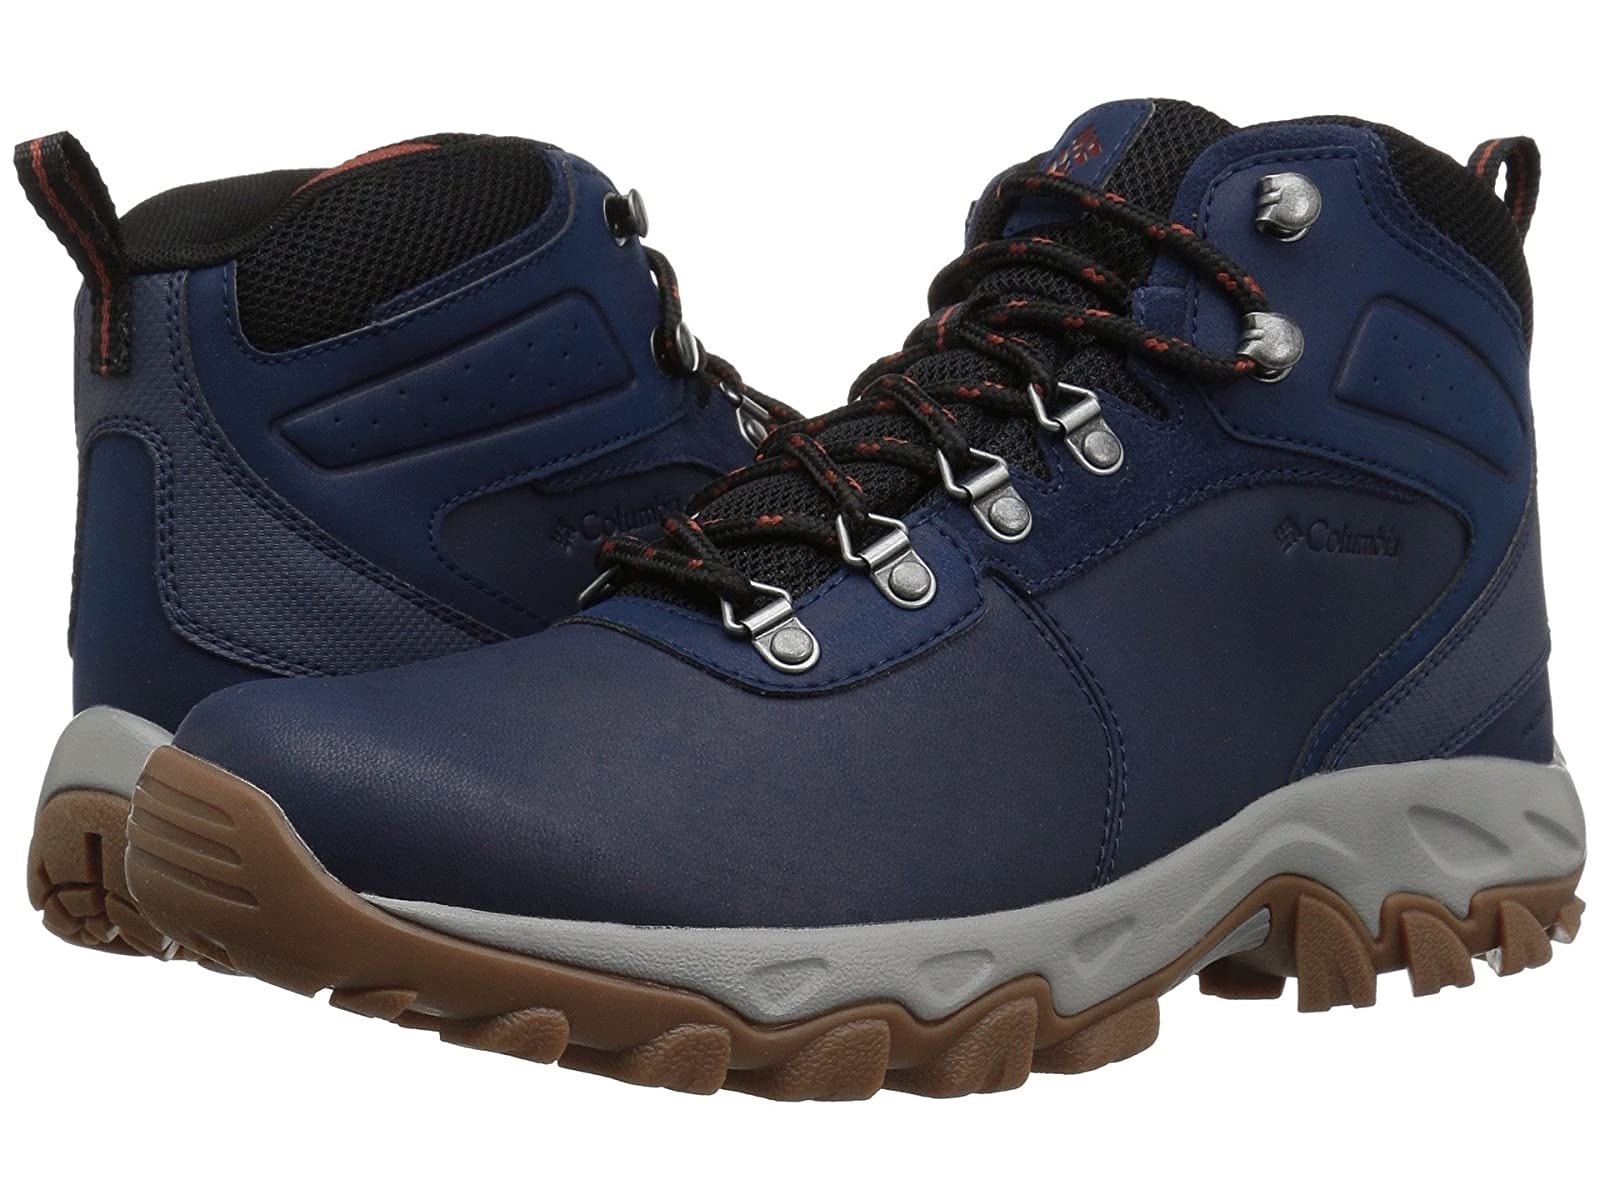 Columbia Newton Ridge Plus II WaterproofAffordable and distinctive shoes